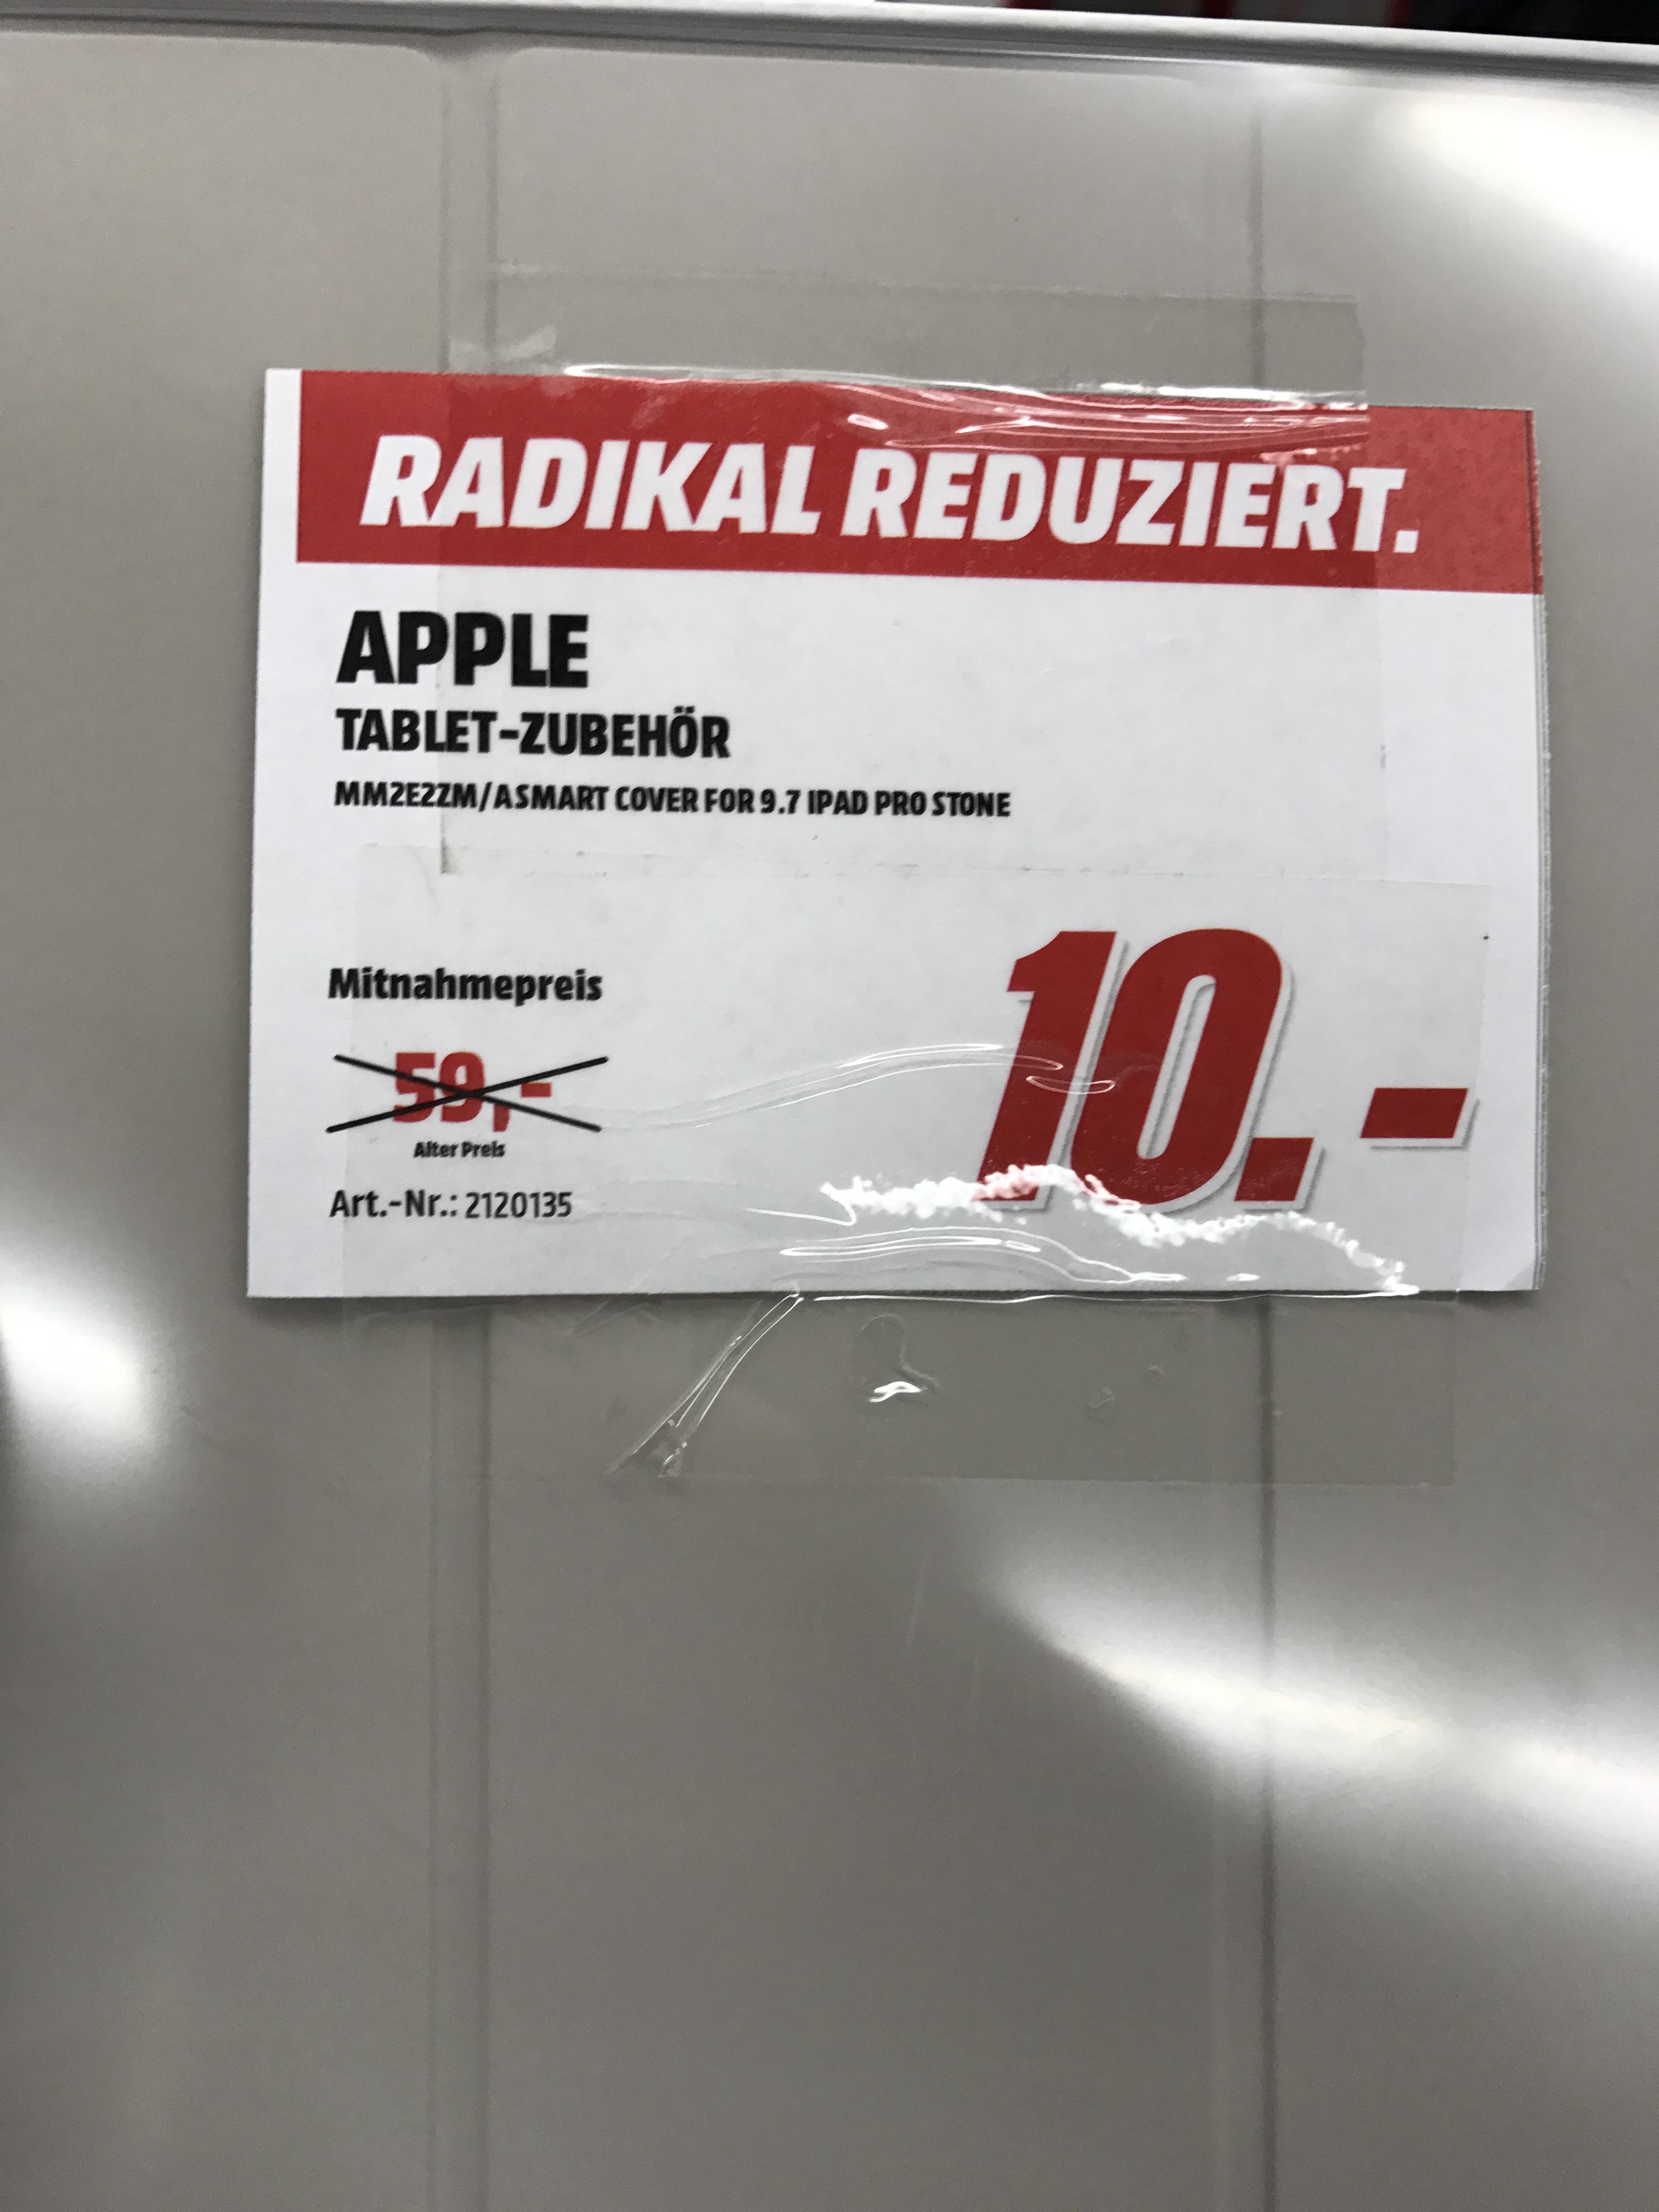 [Lokal MM Würzburg] Diverses Apple Zubehör stark reduziert, z.B. iPad Smart Cover